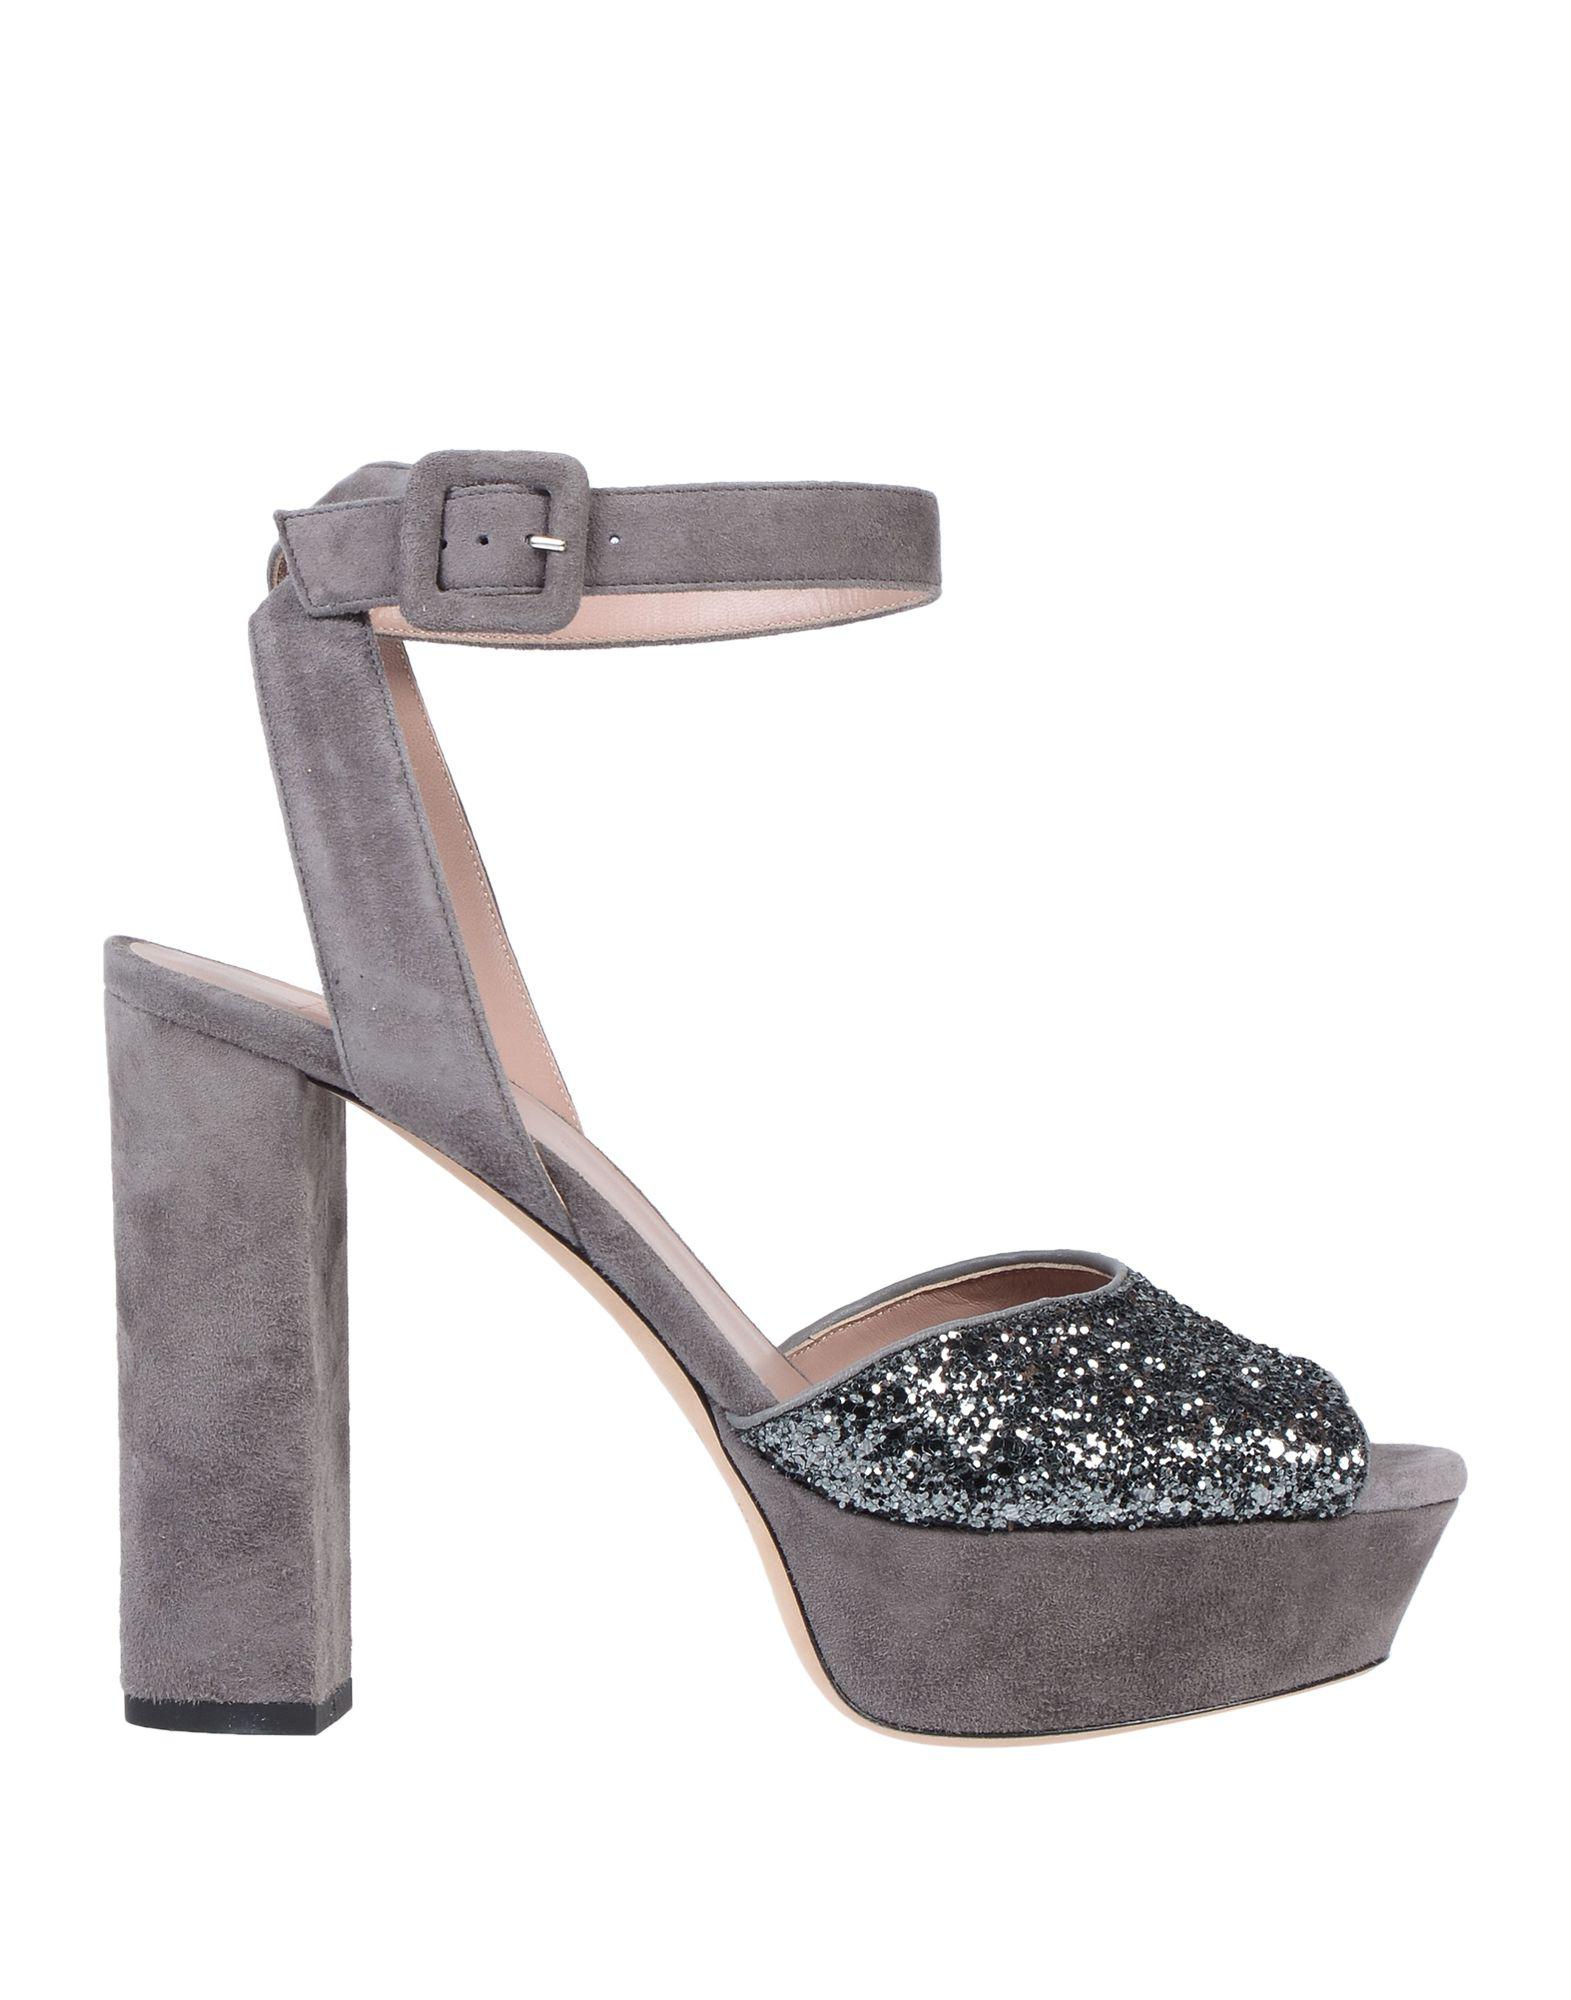 Gianna Meliani Sandals In Grey